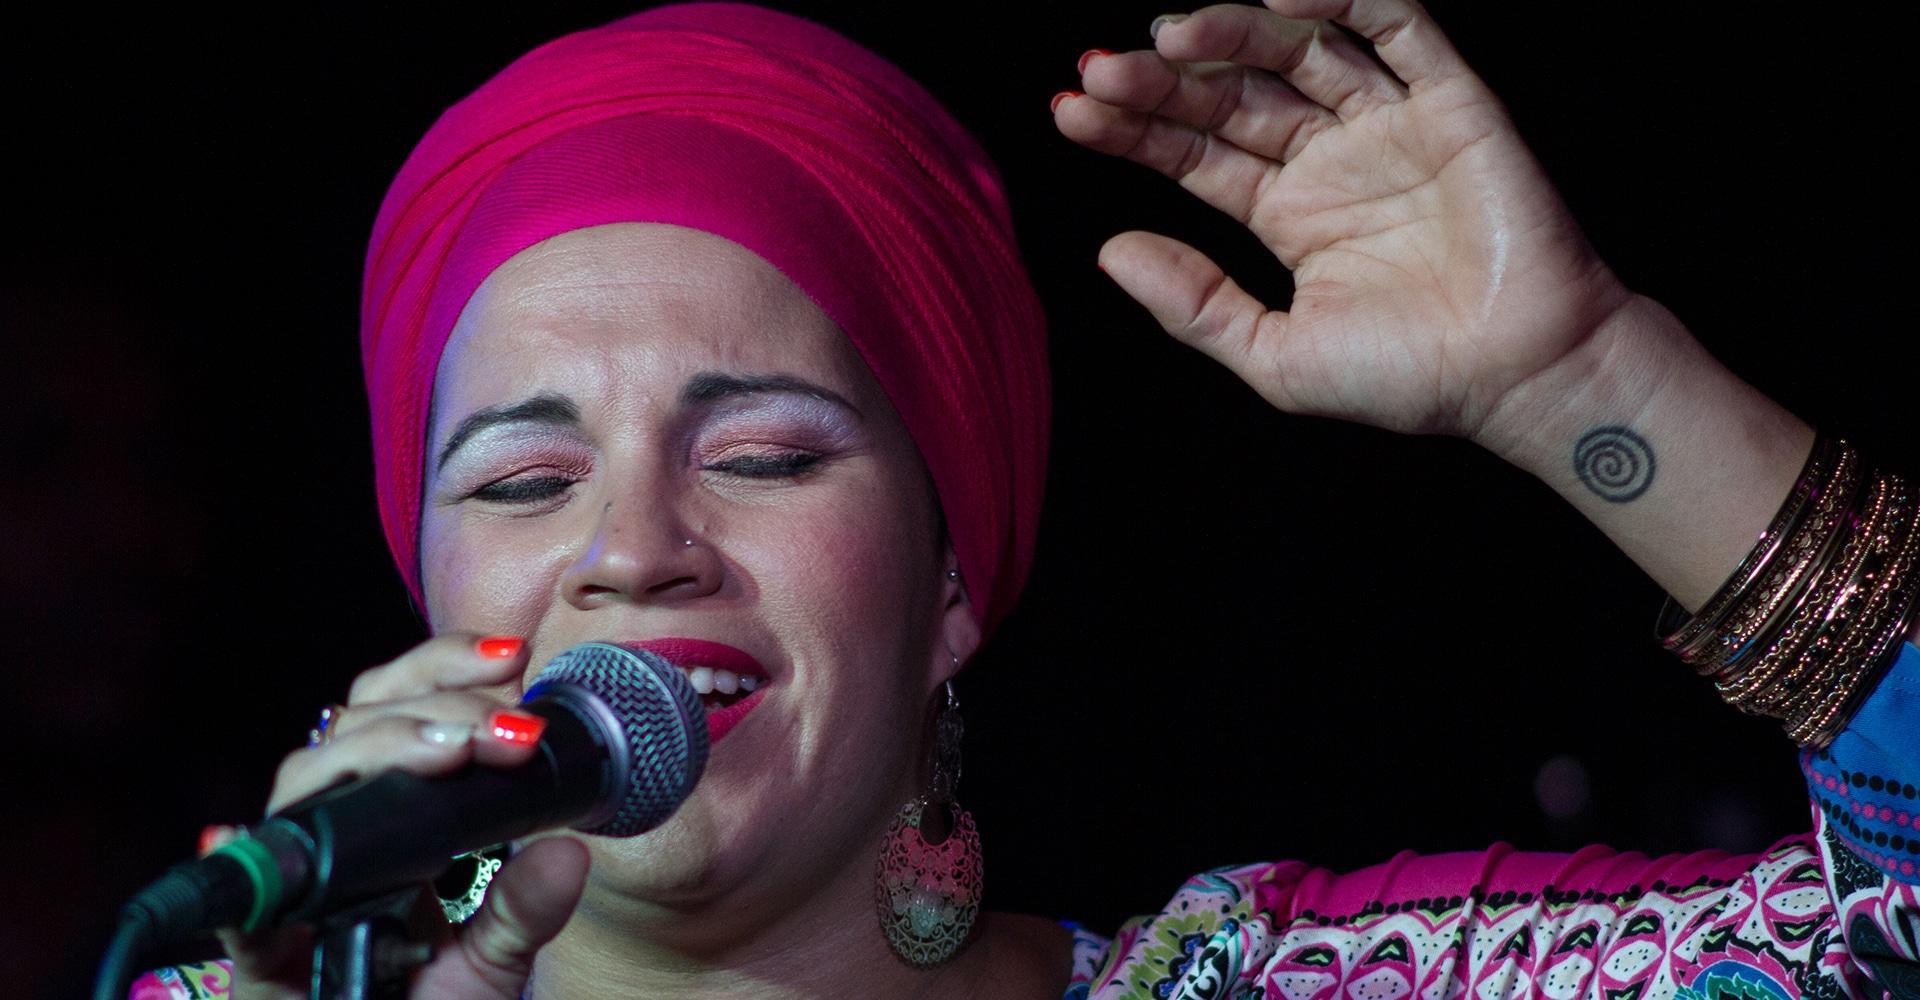 Cuba: Antes, Ahora / Then, Now – Artist Conversations